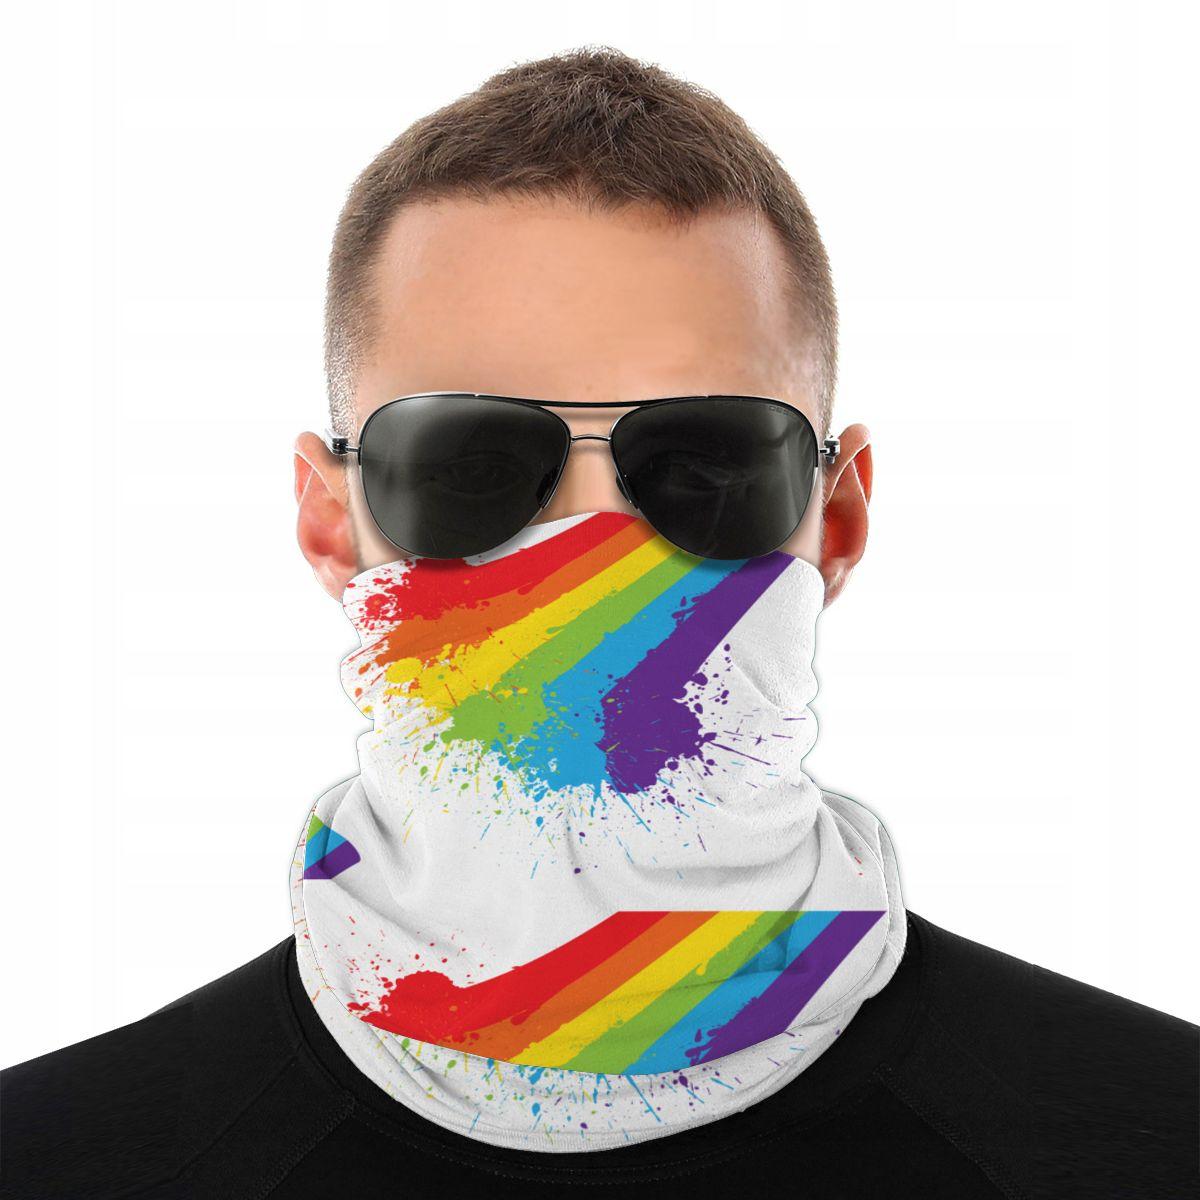 Arco-íris splat lgbt orgulho cachecol meia máscara facial unisex moda tubo máscara pescoço bandanas proteção bandana escalada ao ar livre